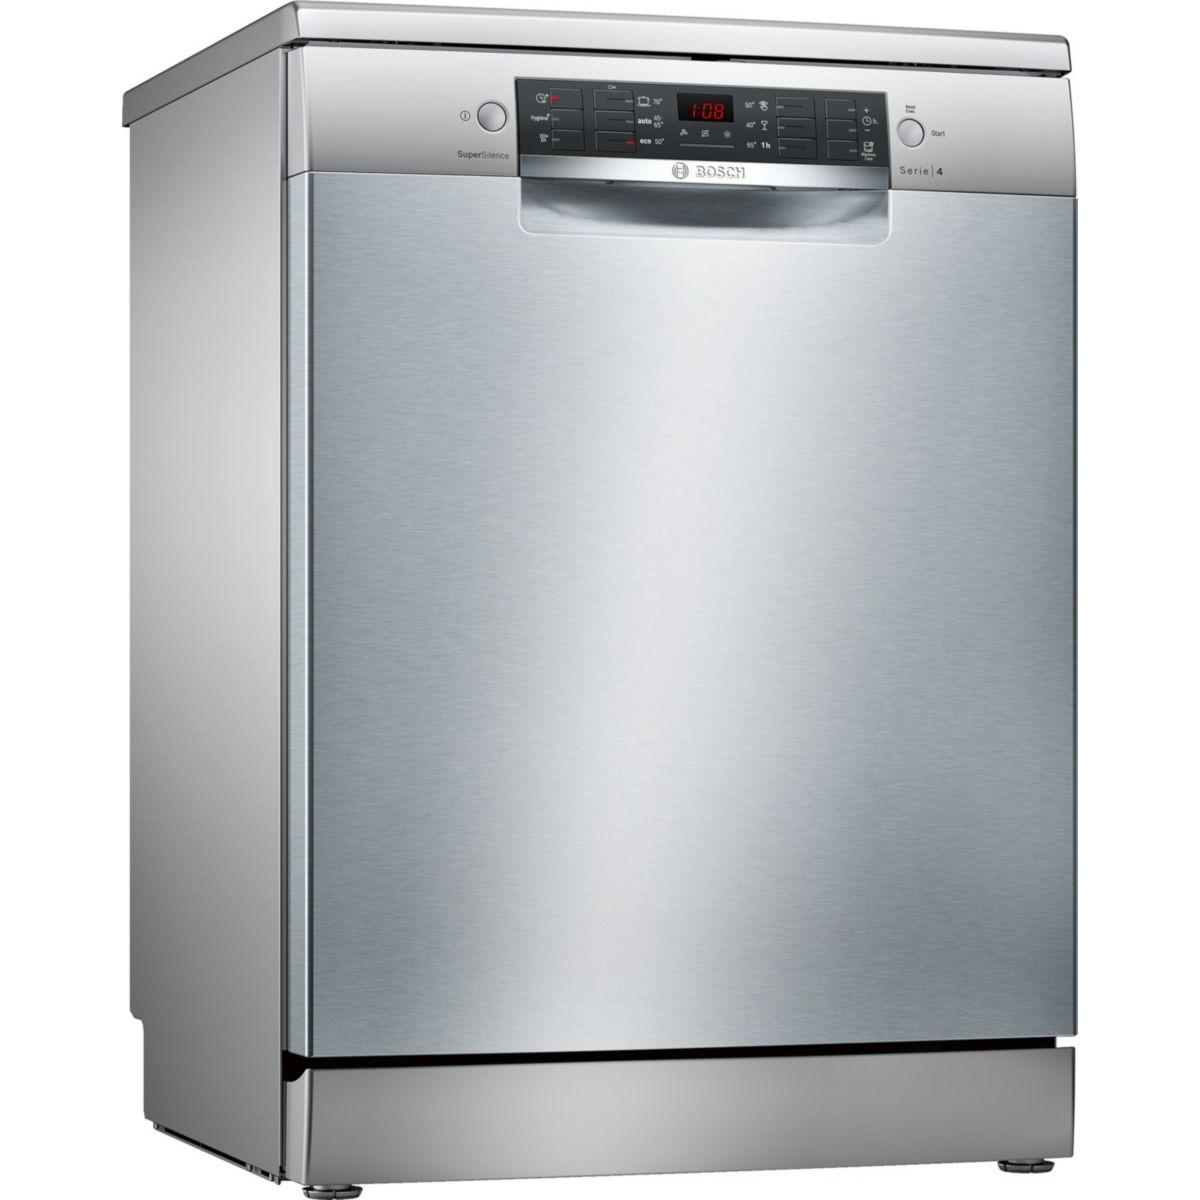 Lave vaisselle 60 cm BOSCH SMS46II03E